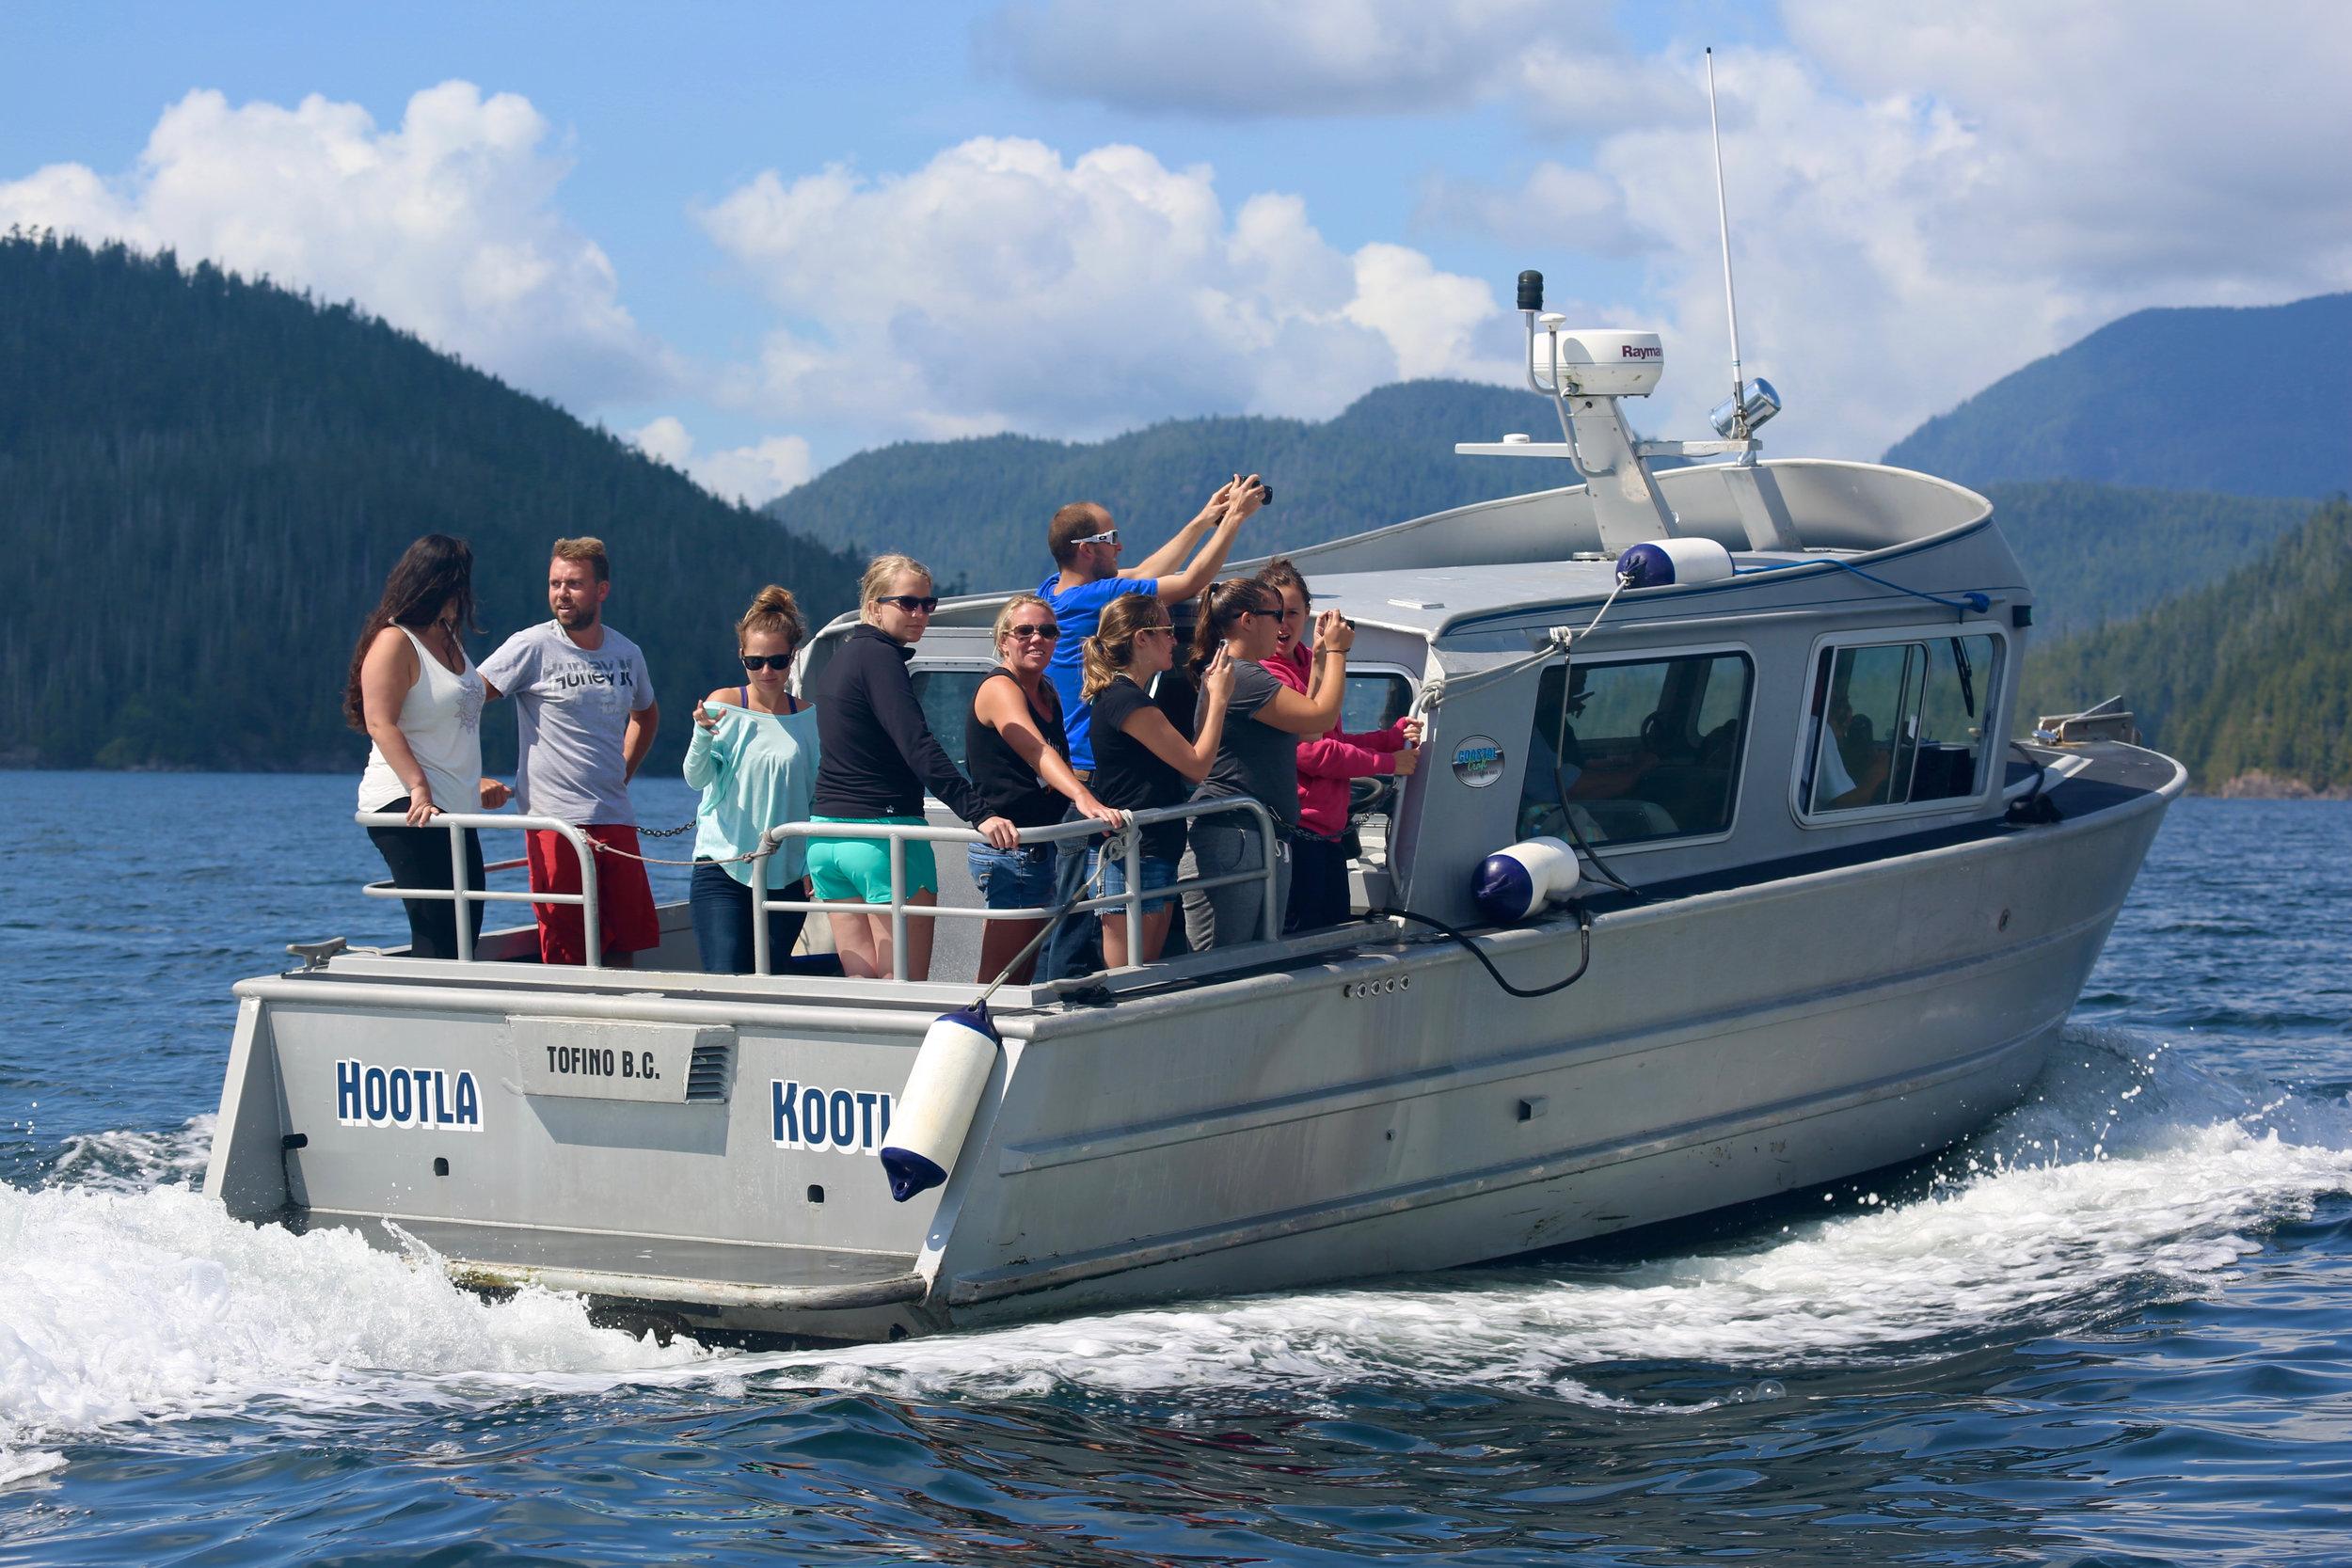 Hootla Kootla Hot Springs Boat .jpg